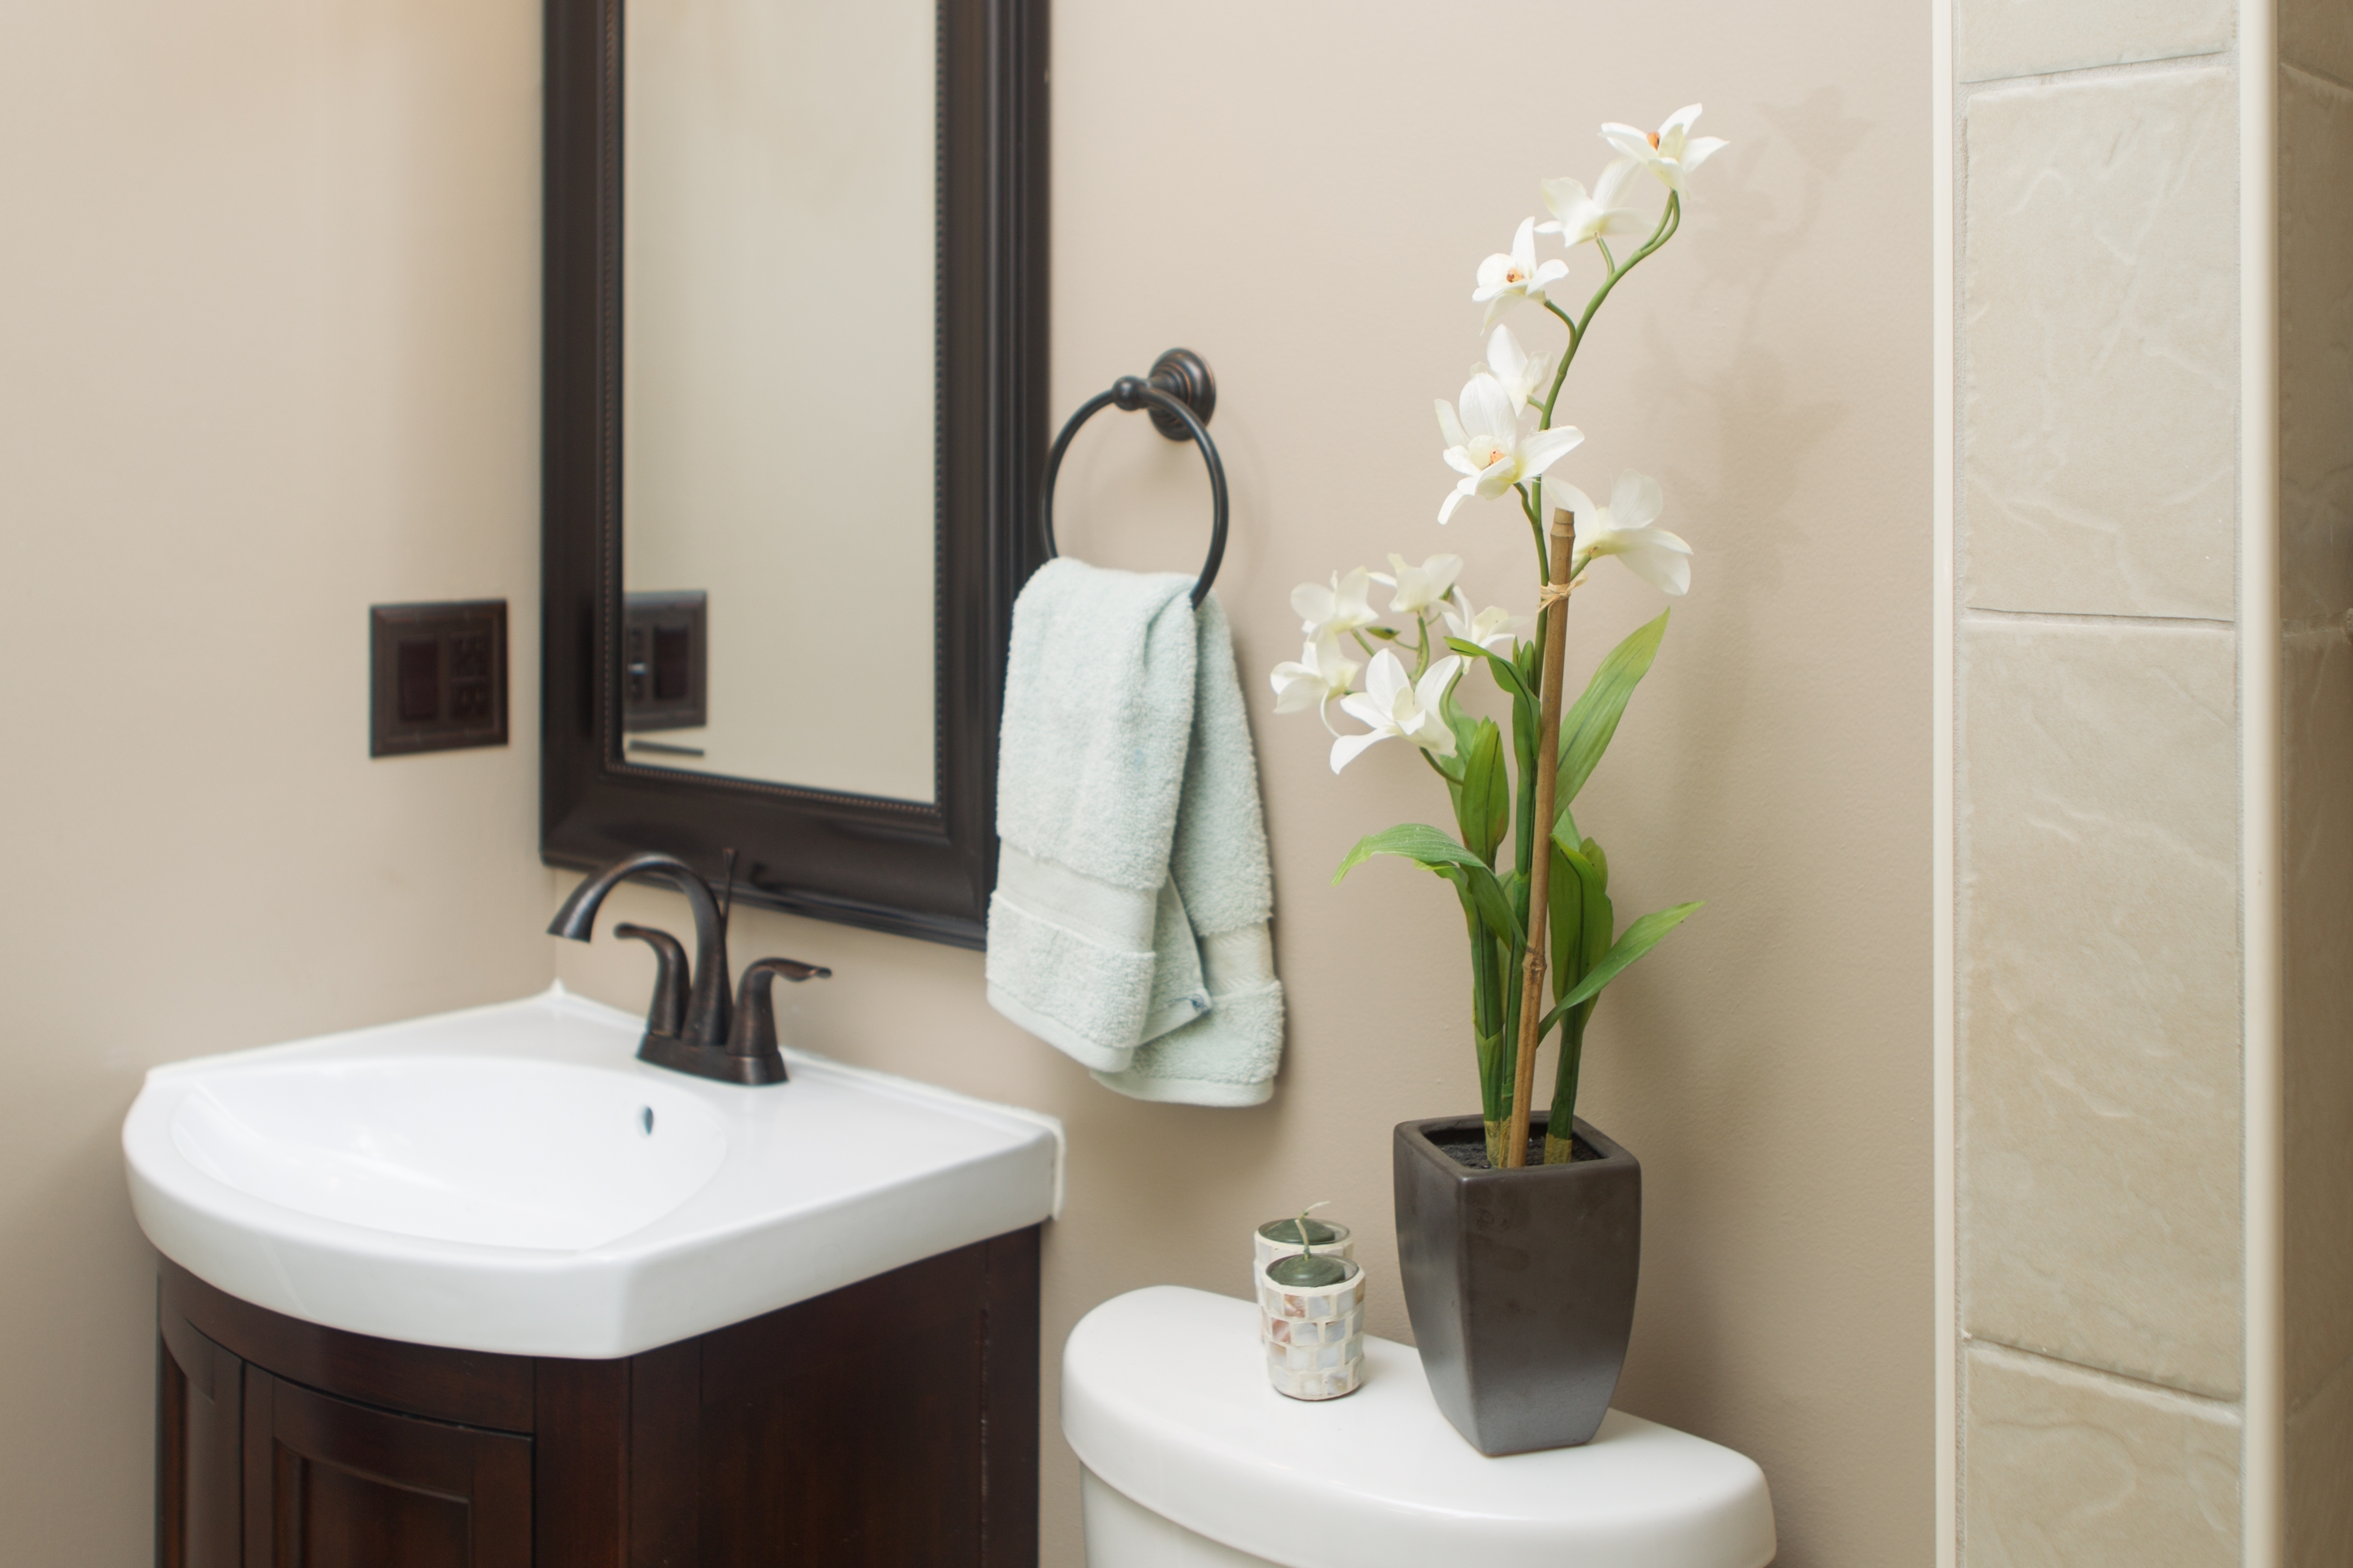 Small Bathroom Decorating Ideas simple small bathroom decorating ideas on small resident remodel OQNHVHR